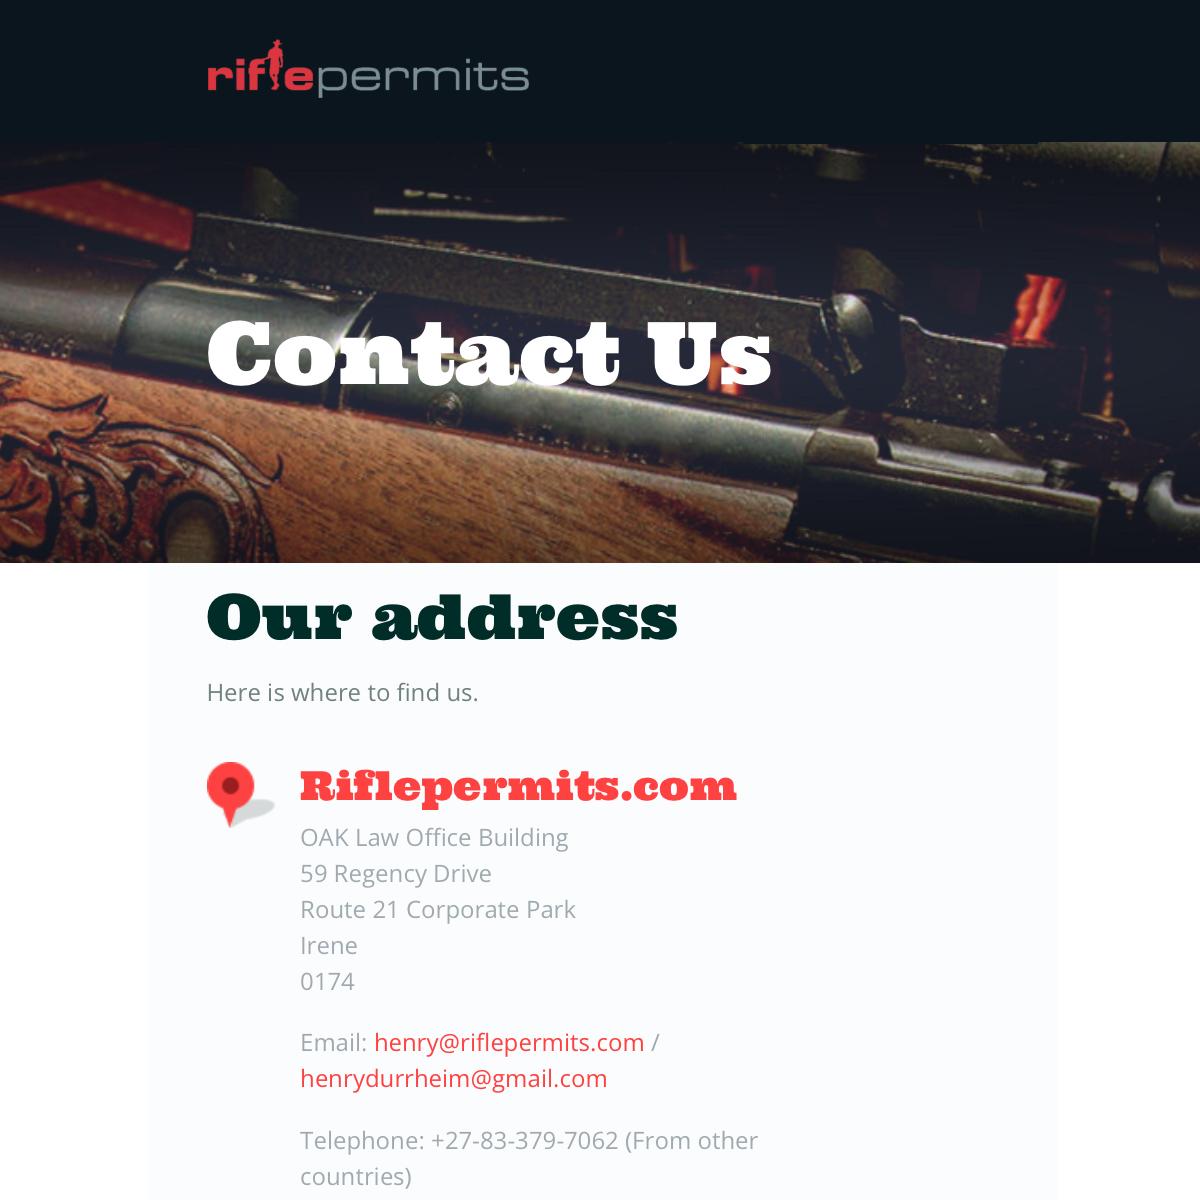 riflepermits-07.jpg